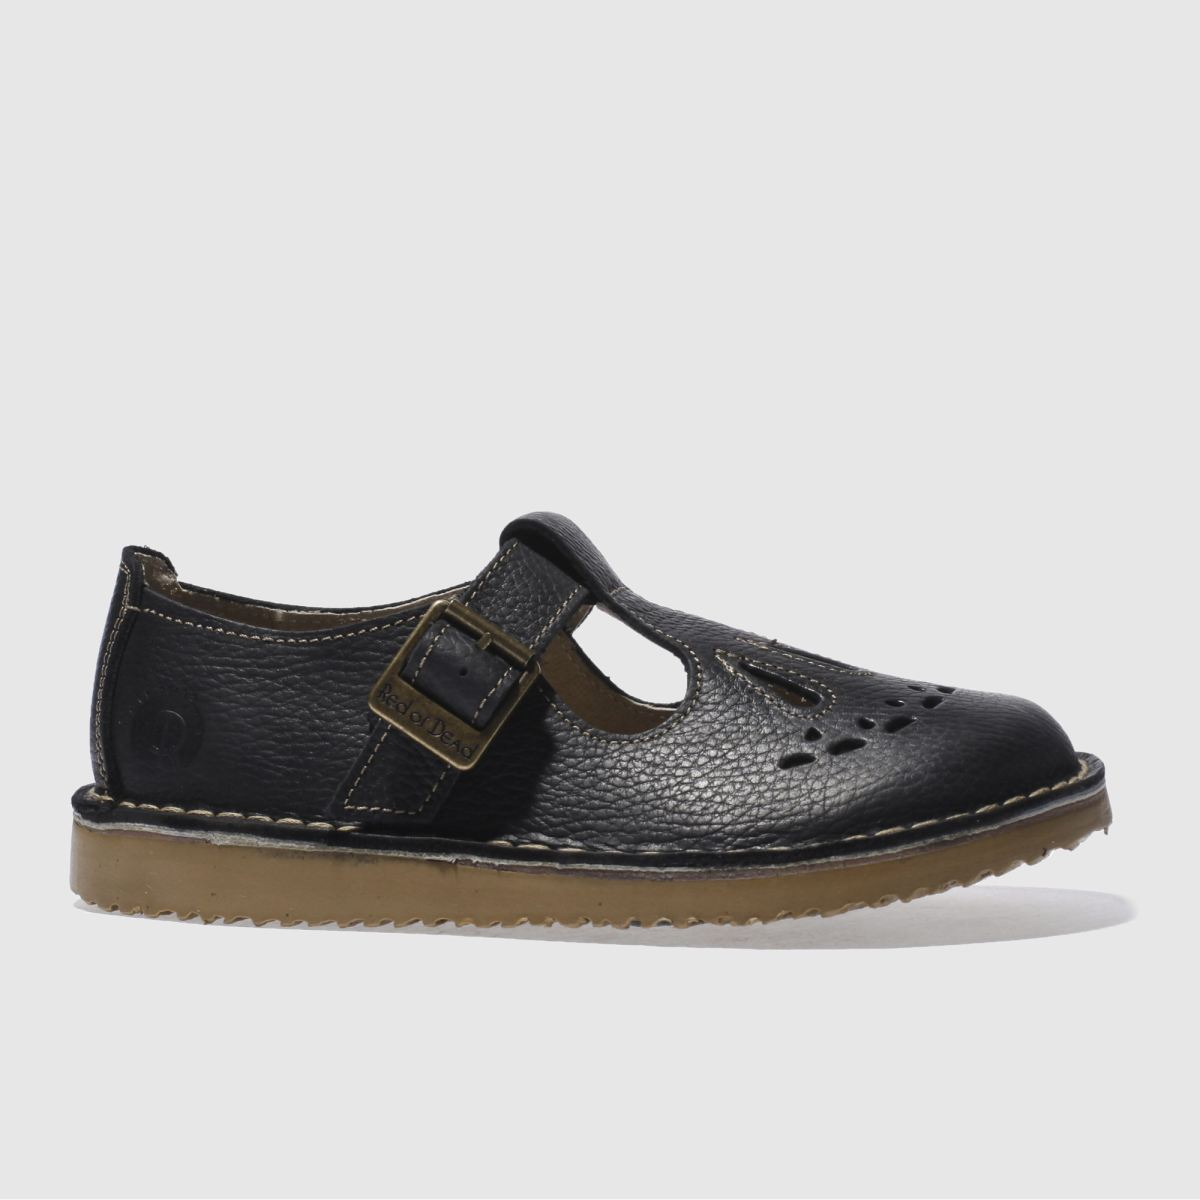 Black sandals littlewoods - Red Or Dead Black Leather Jade Womens Flats